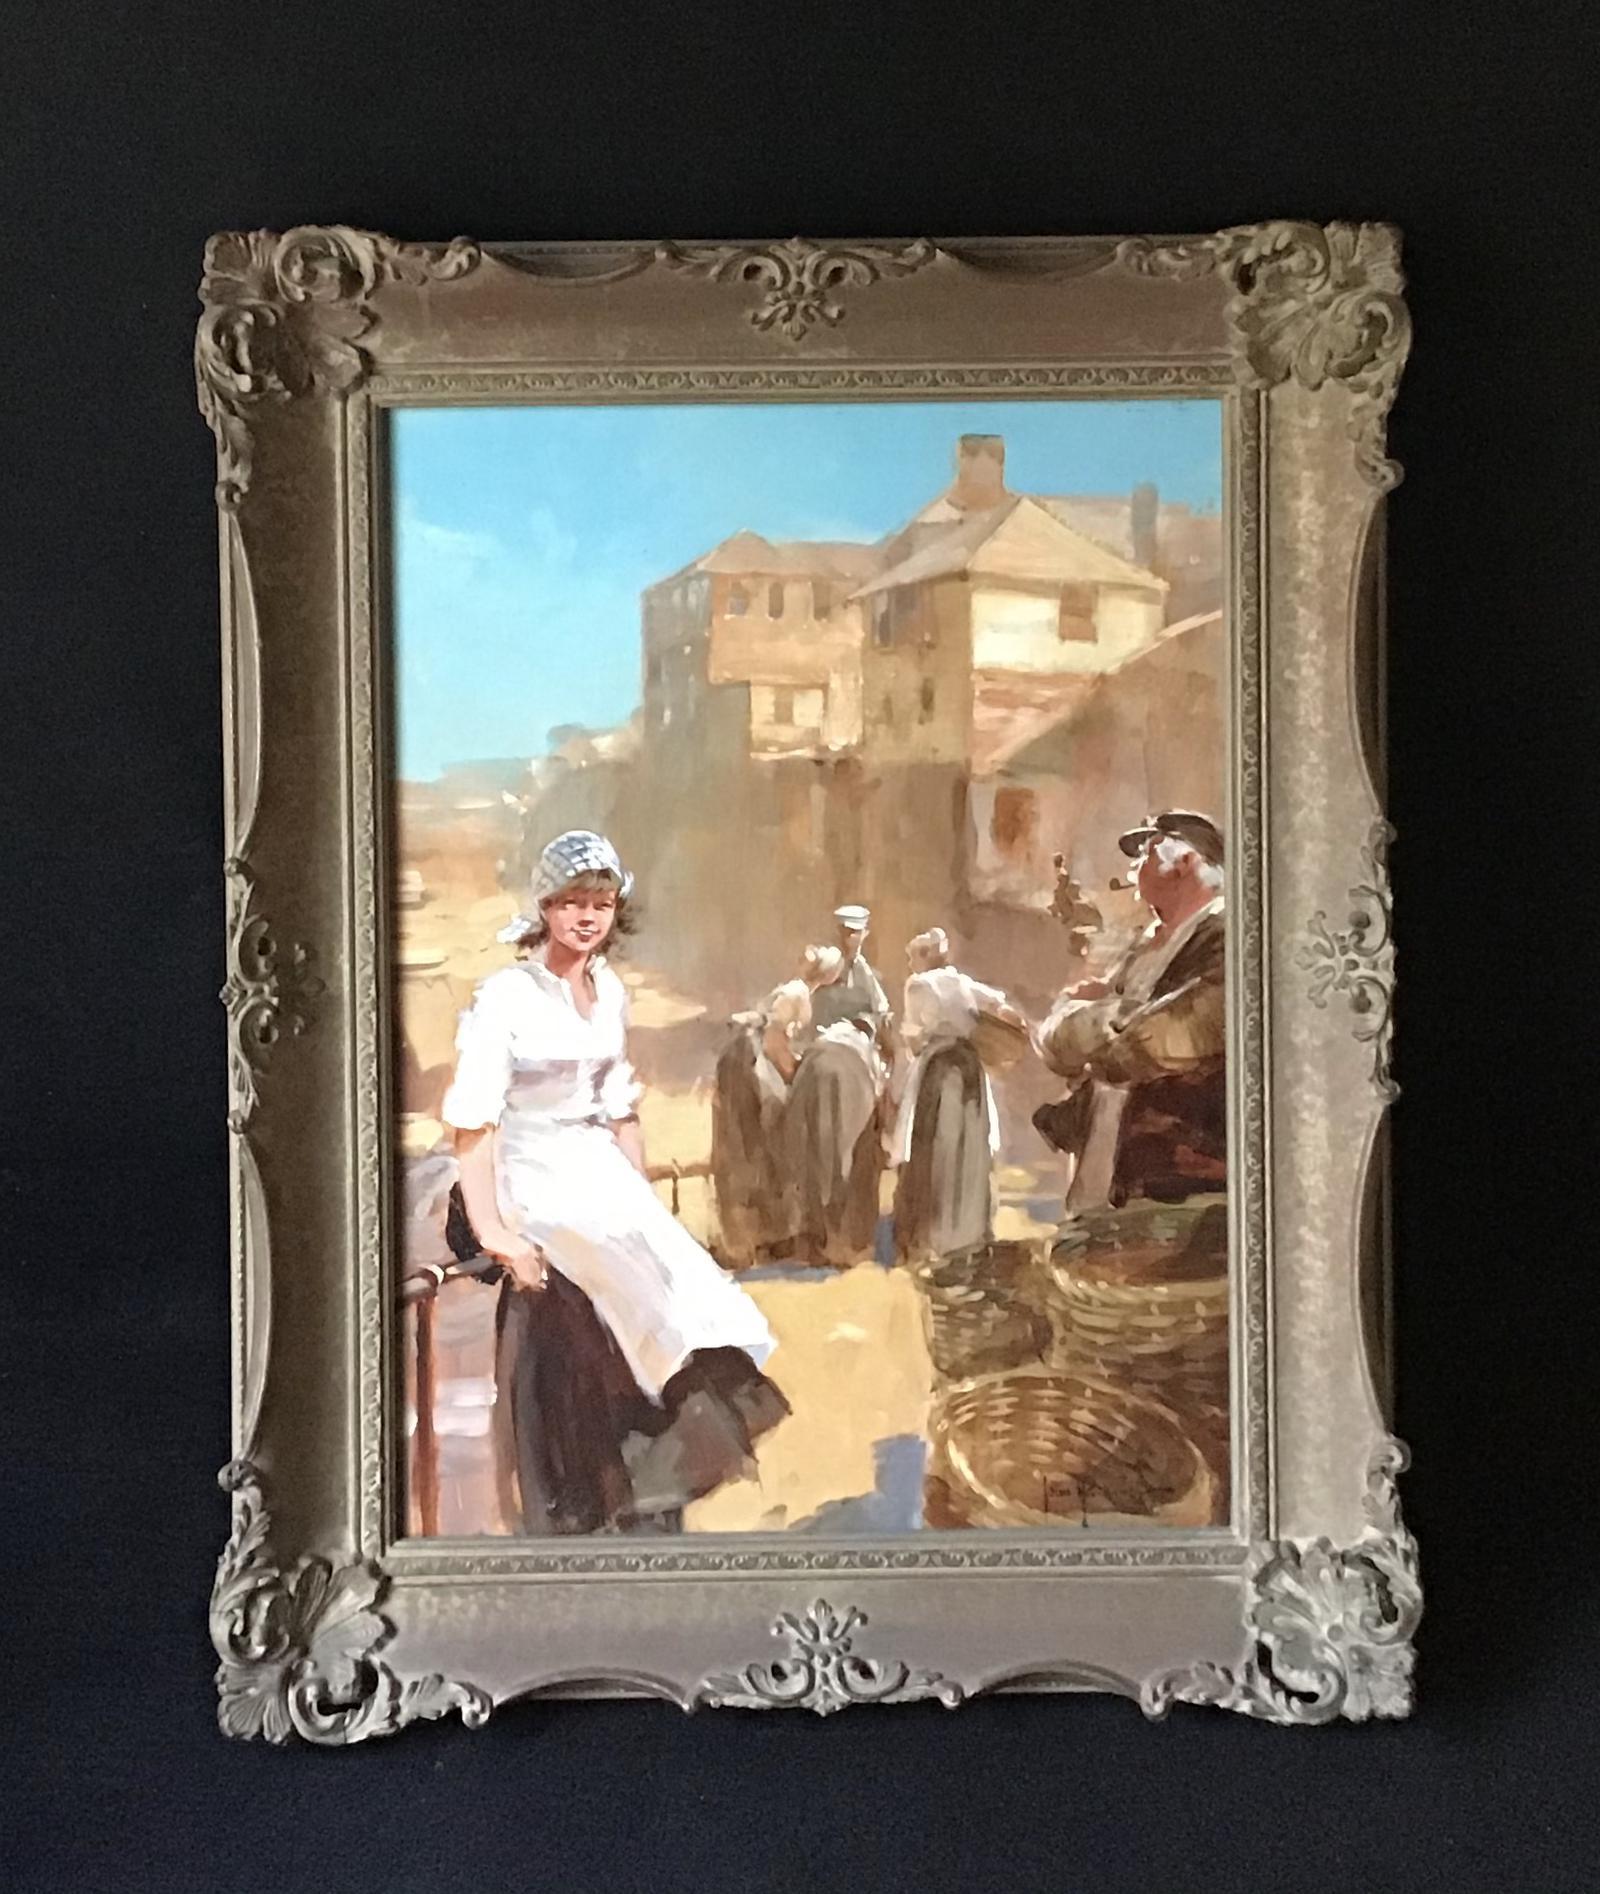 Lomond Antiques image (7 of 10)